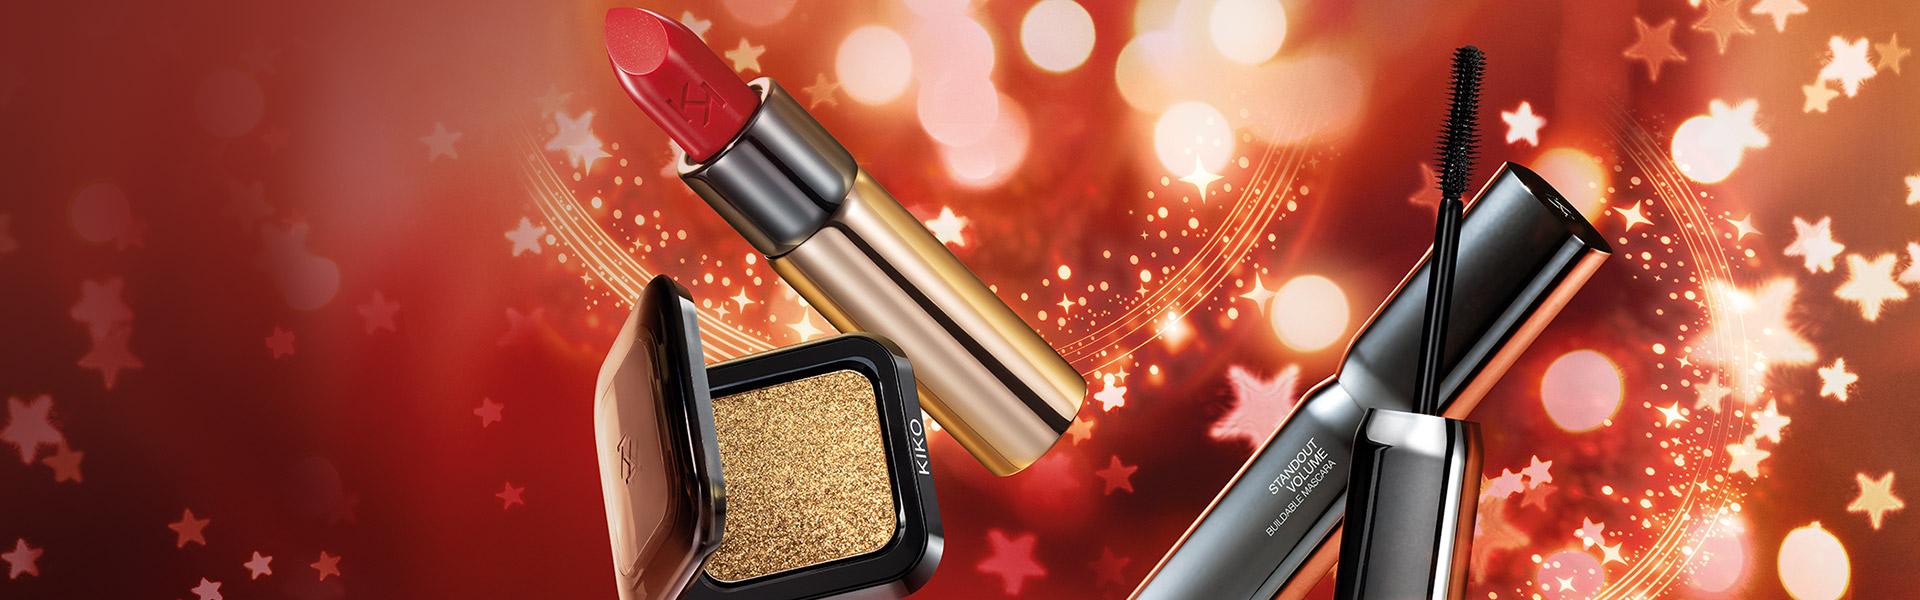 Calendrier Kiko.Kiko Milano Boutique En Ligne De Cosmetiques Maquillage